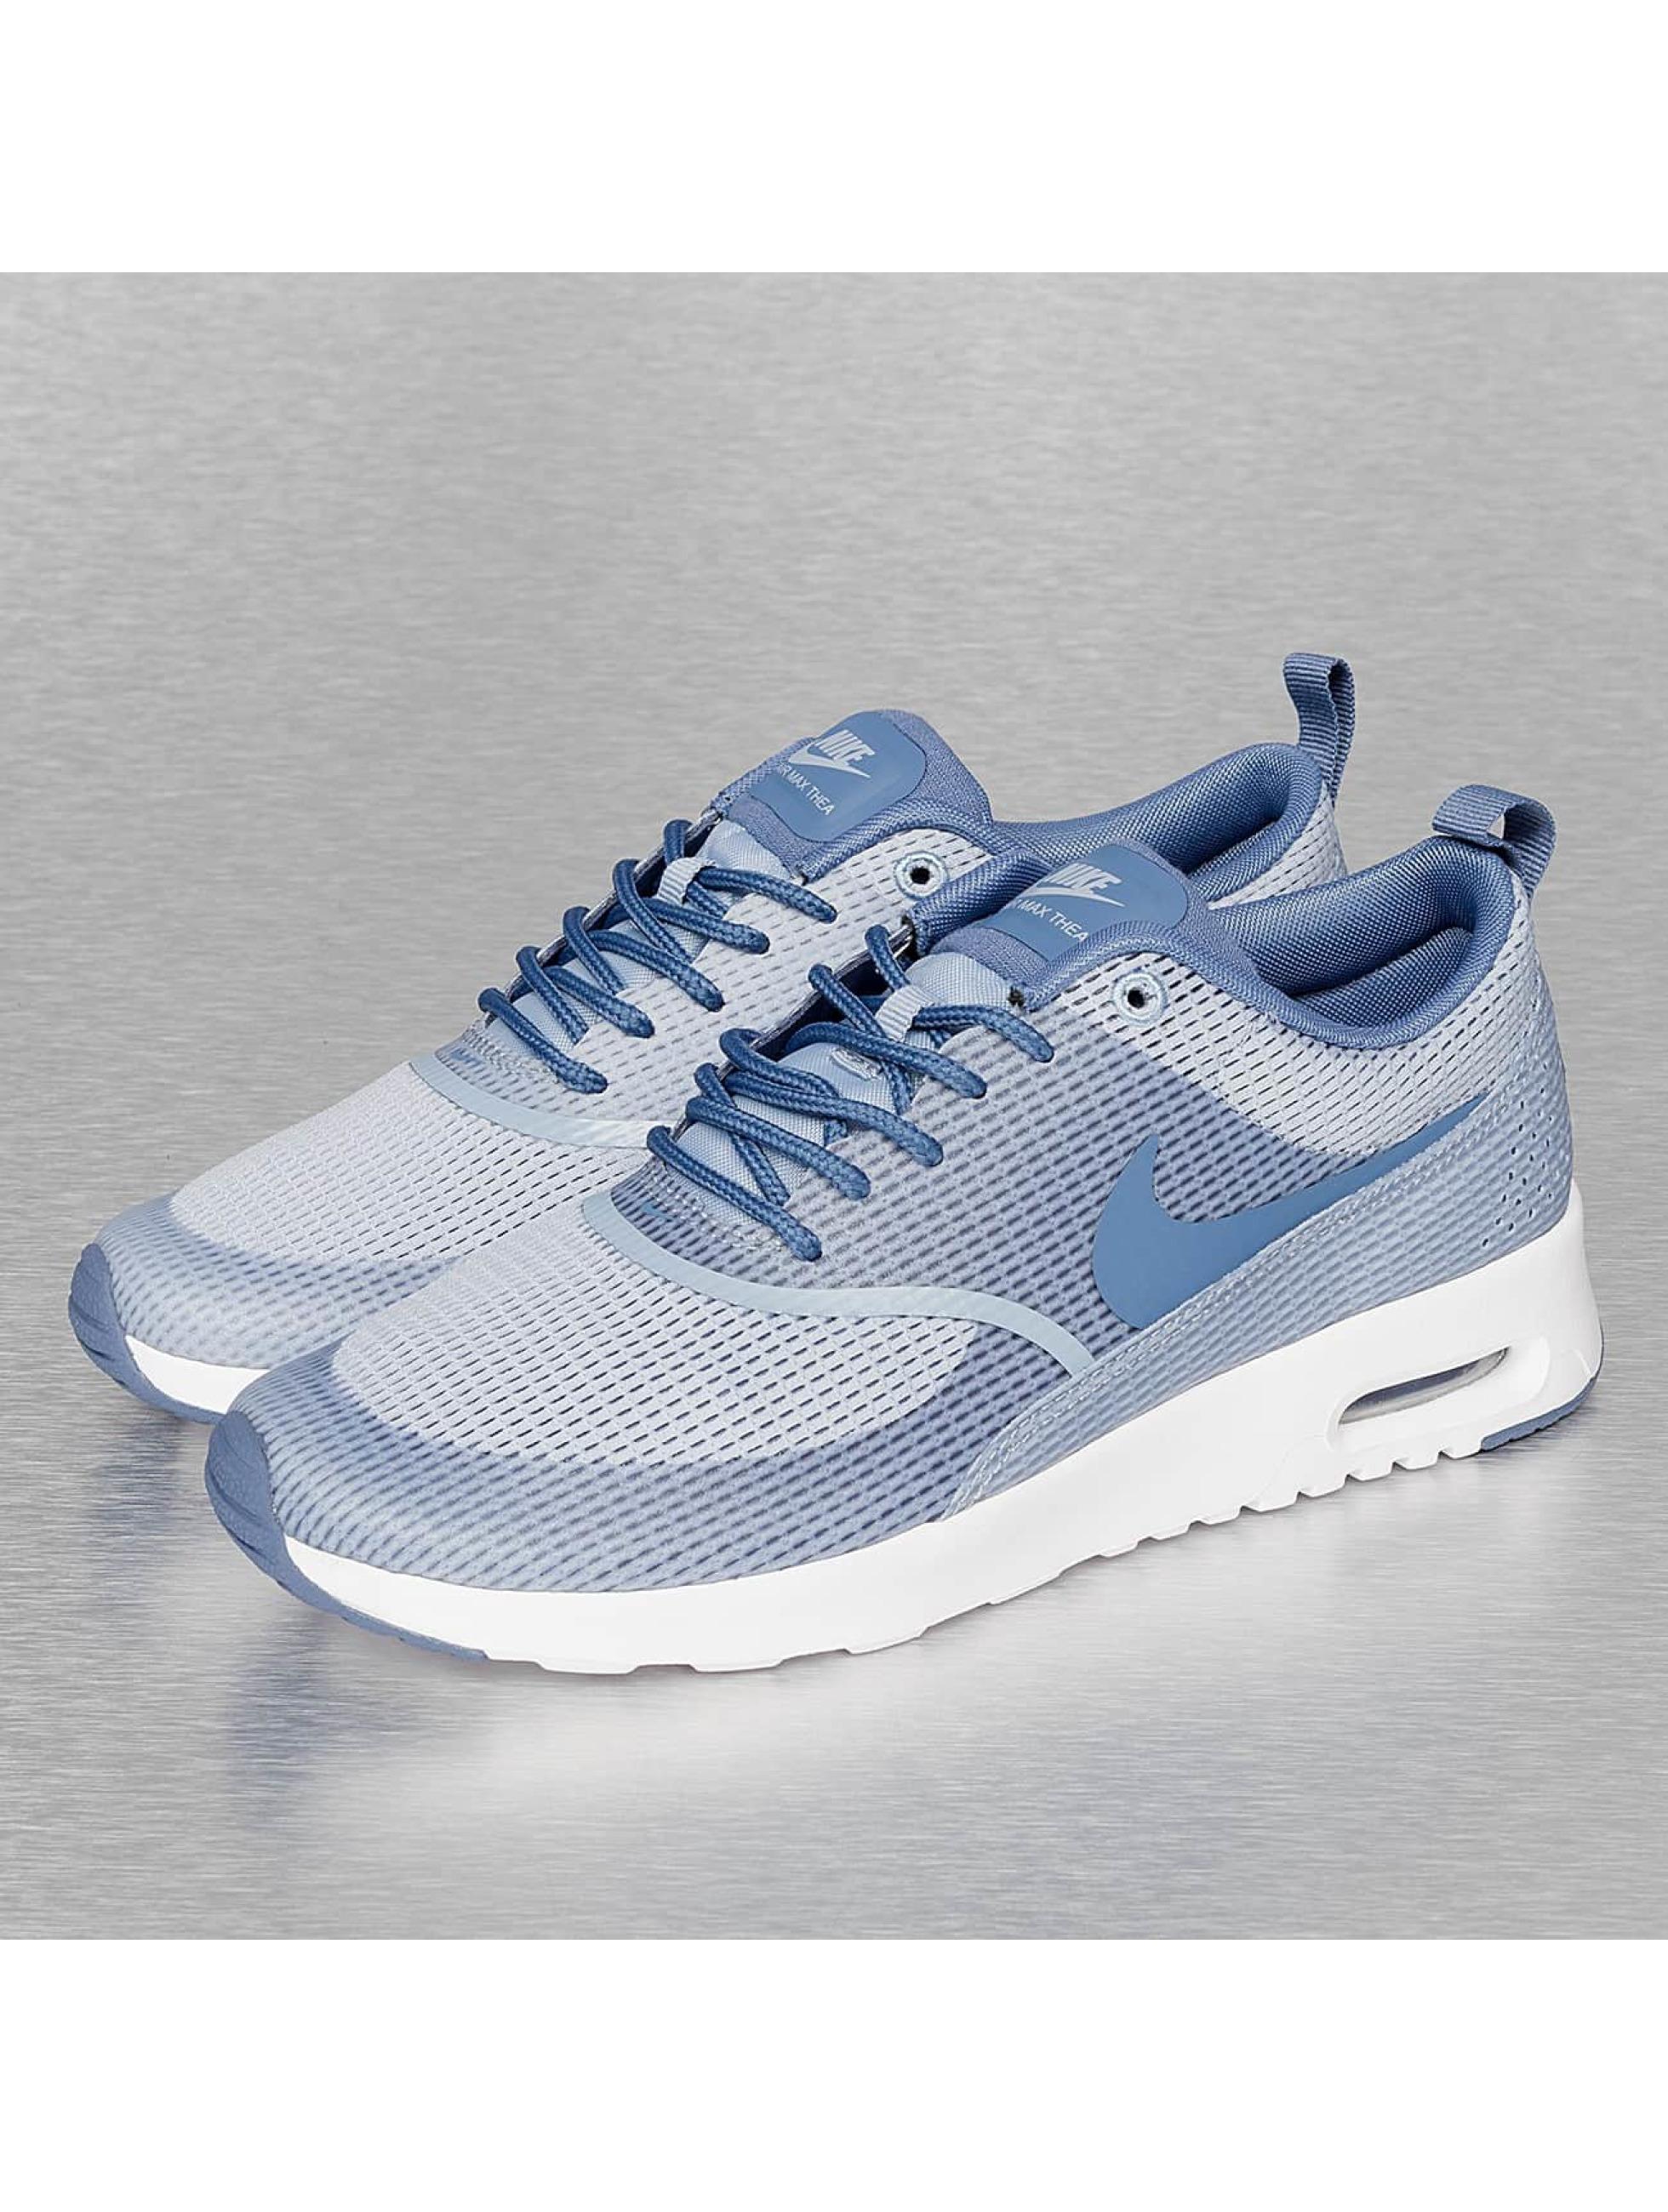 c27cb35adea Nike Air Max 2015 Blauw Paars nikeairmax2015kopen.nl